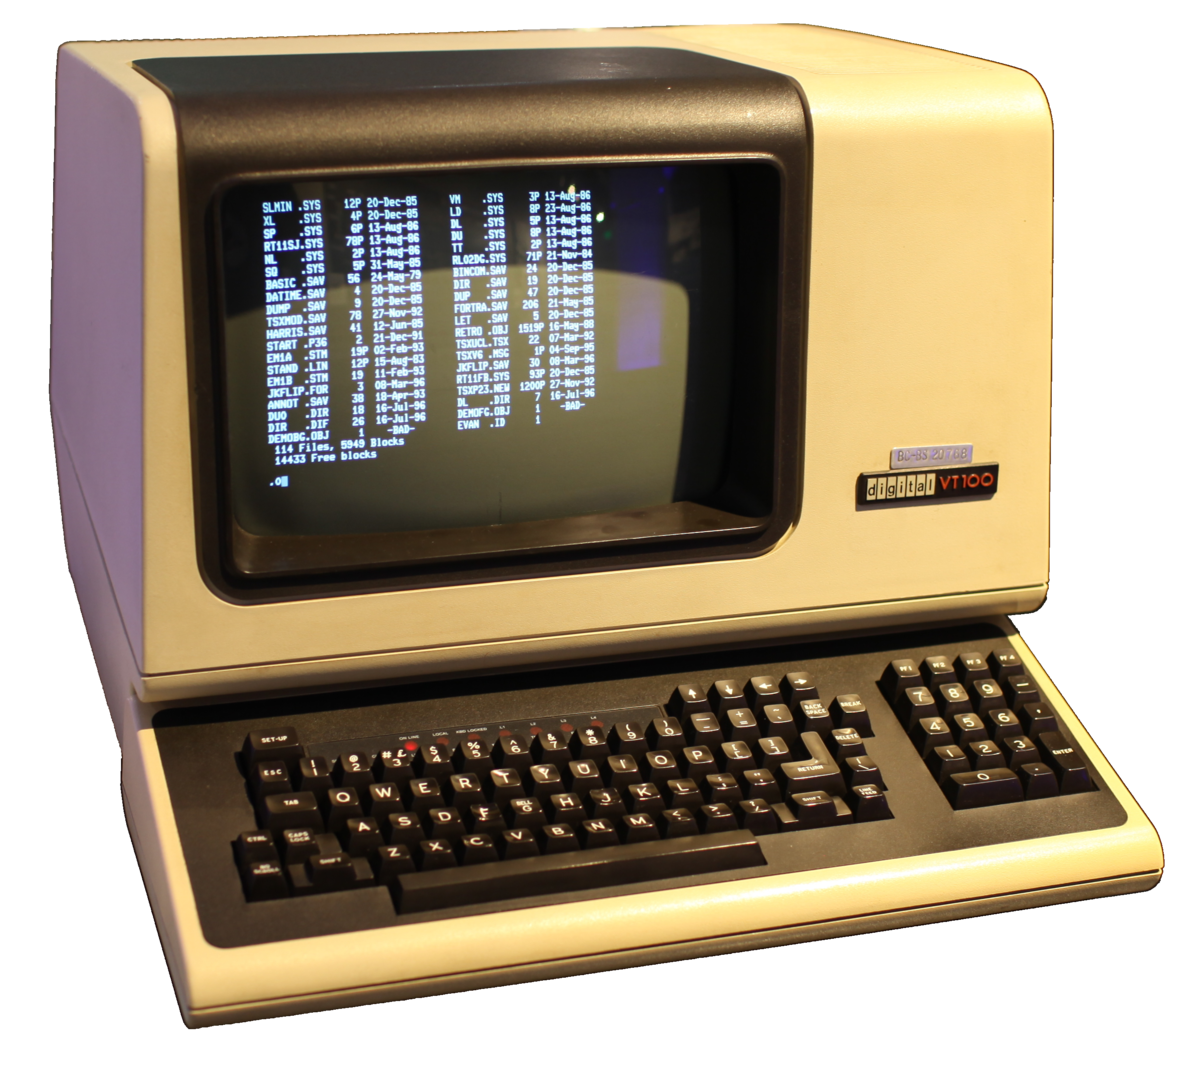 Computer terminal Wikipedia in 2020 Computer terminal